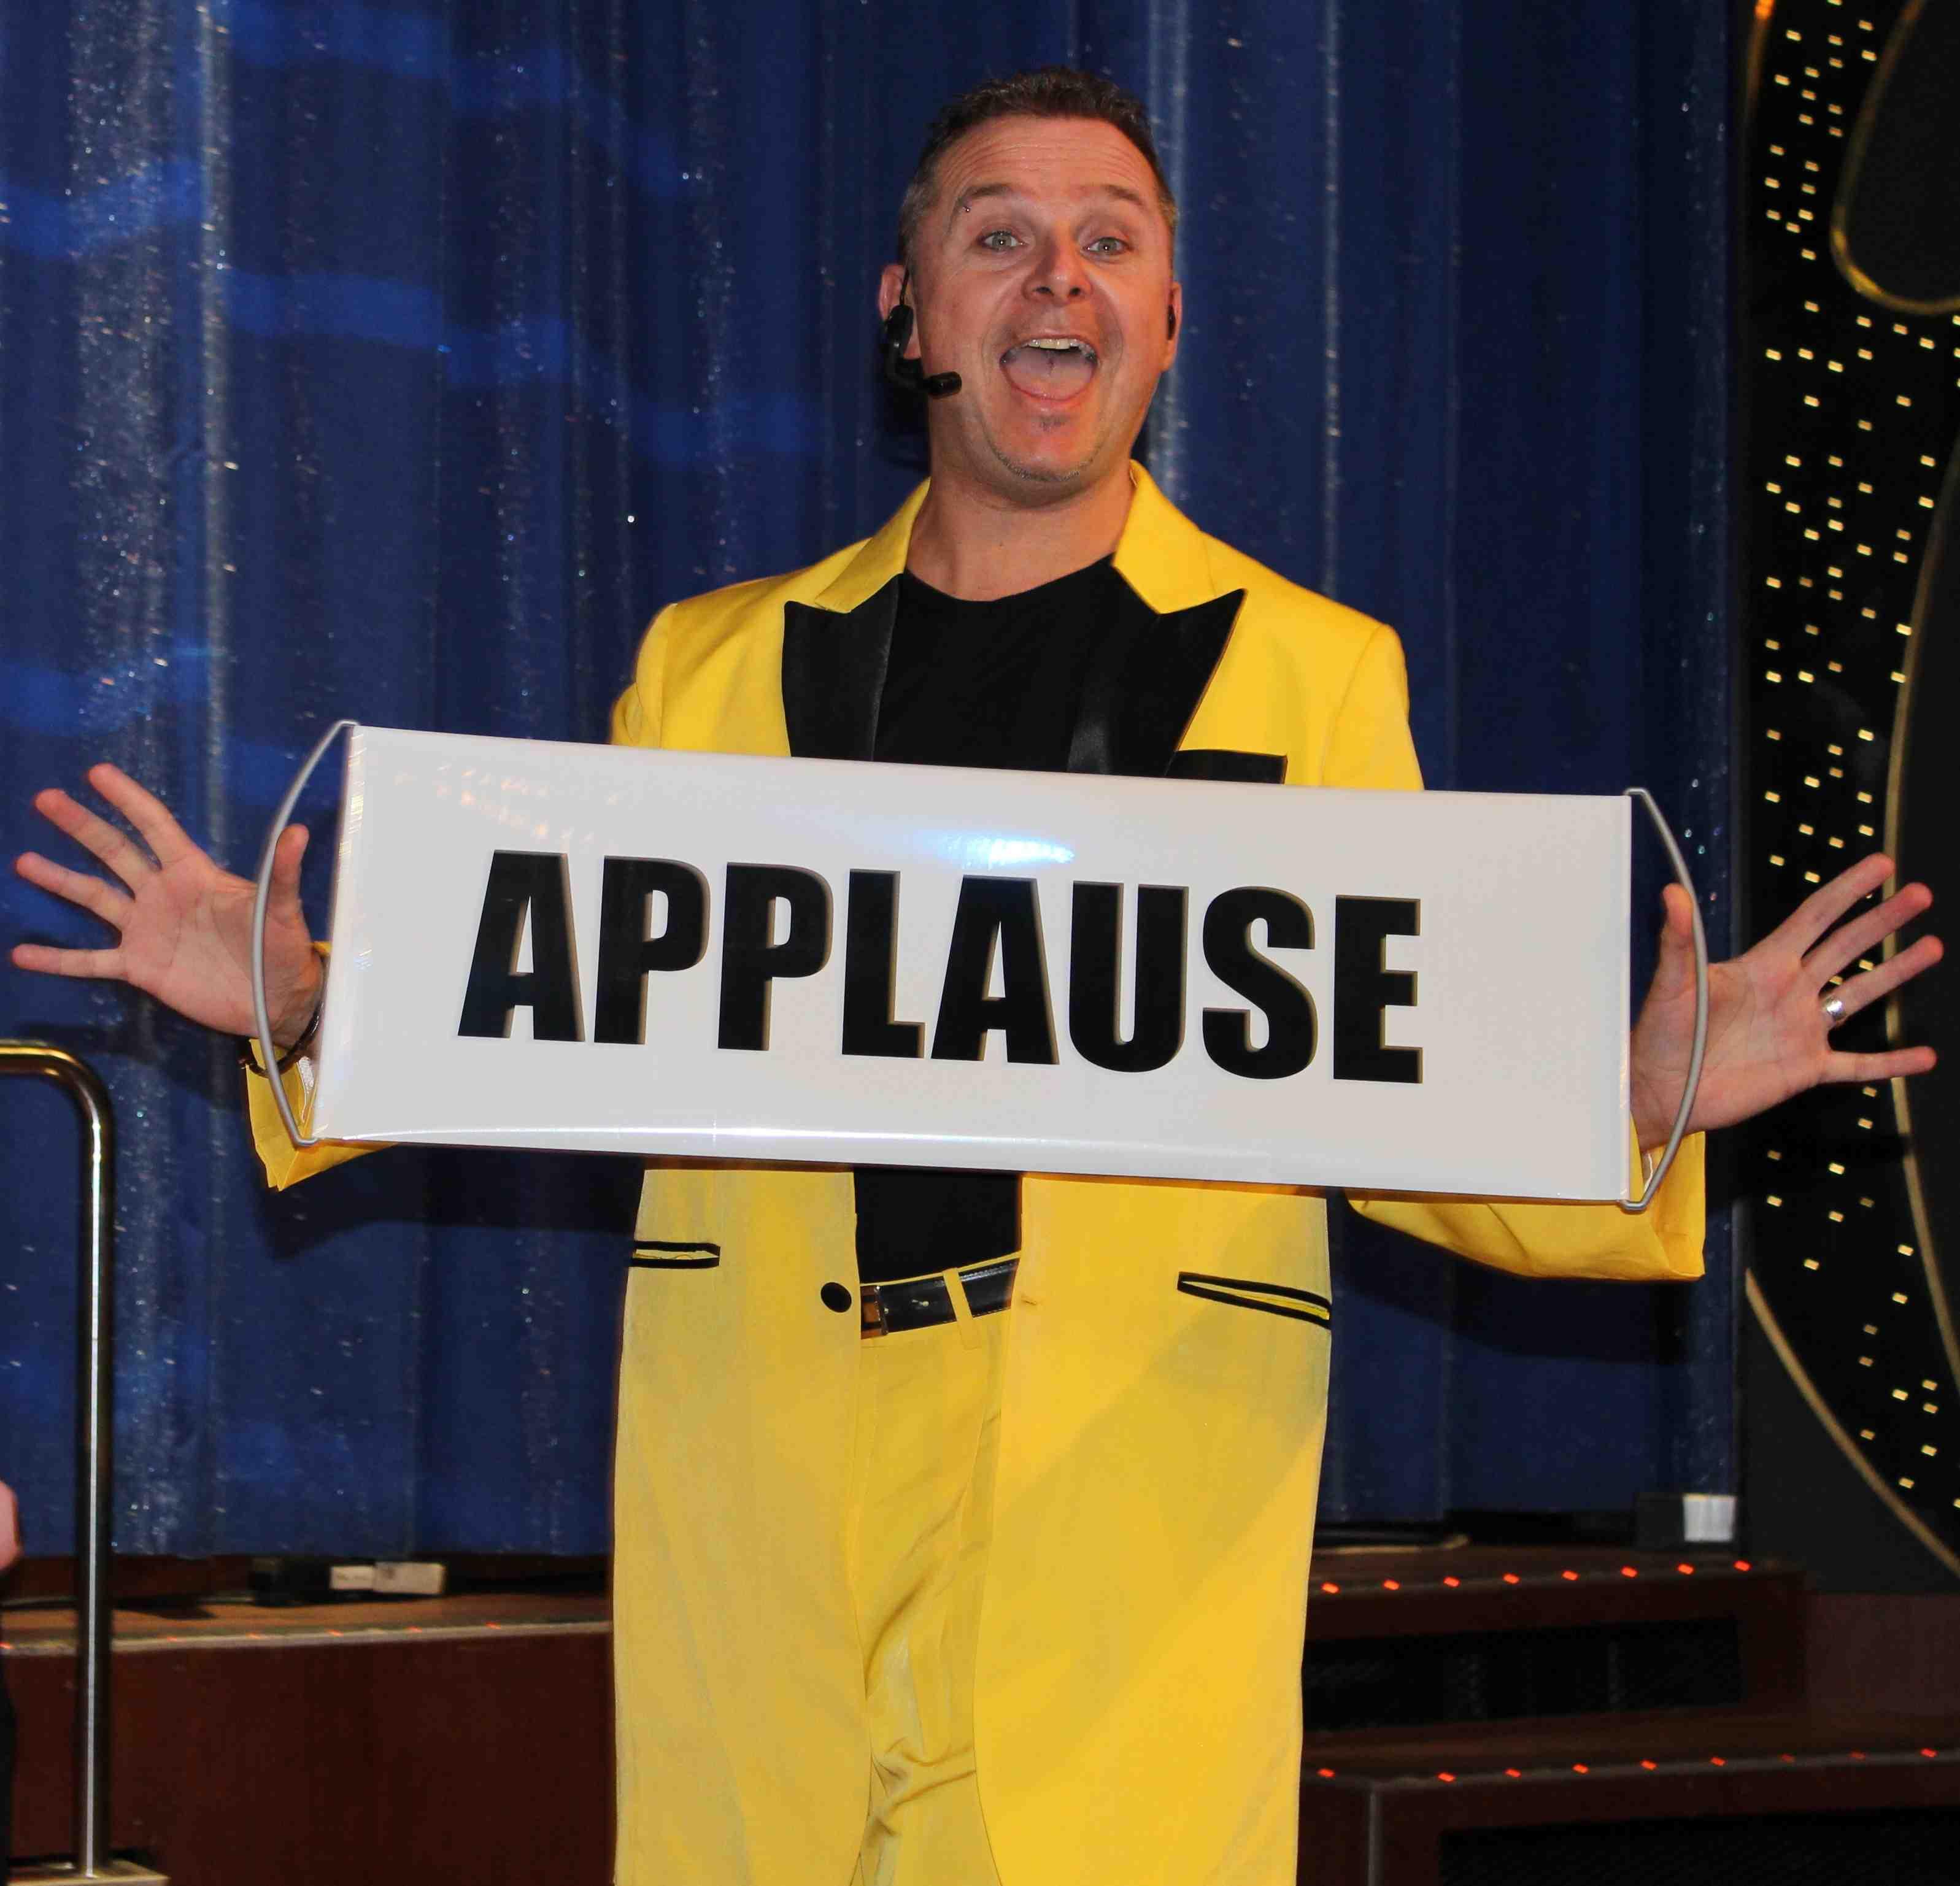 Applause !!2